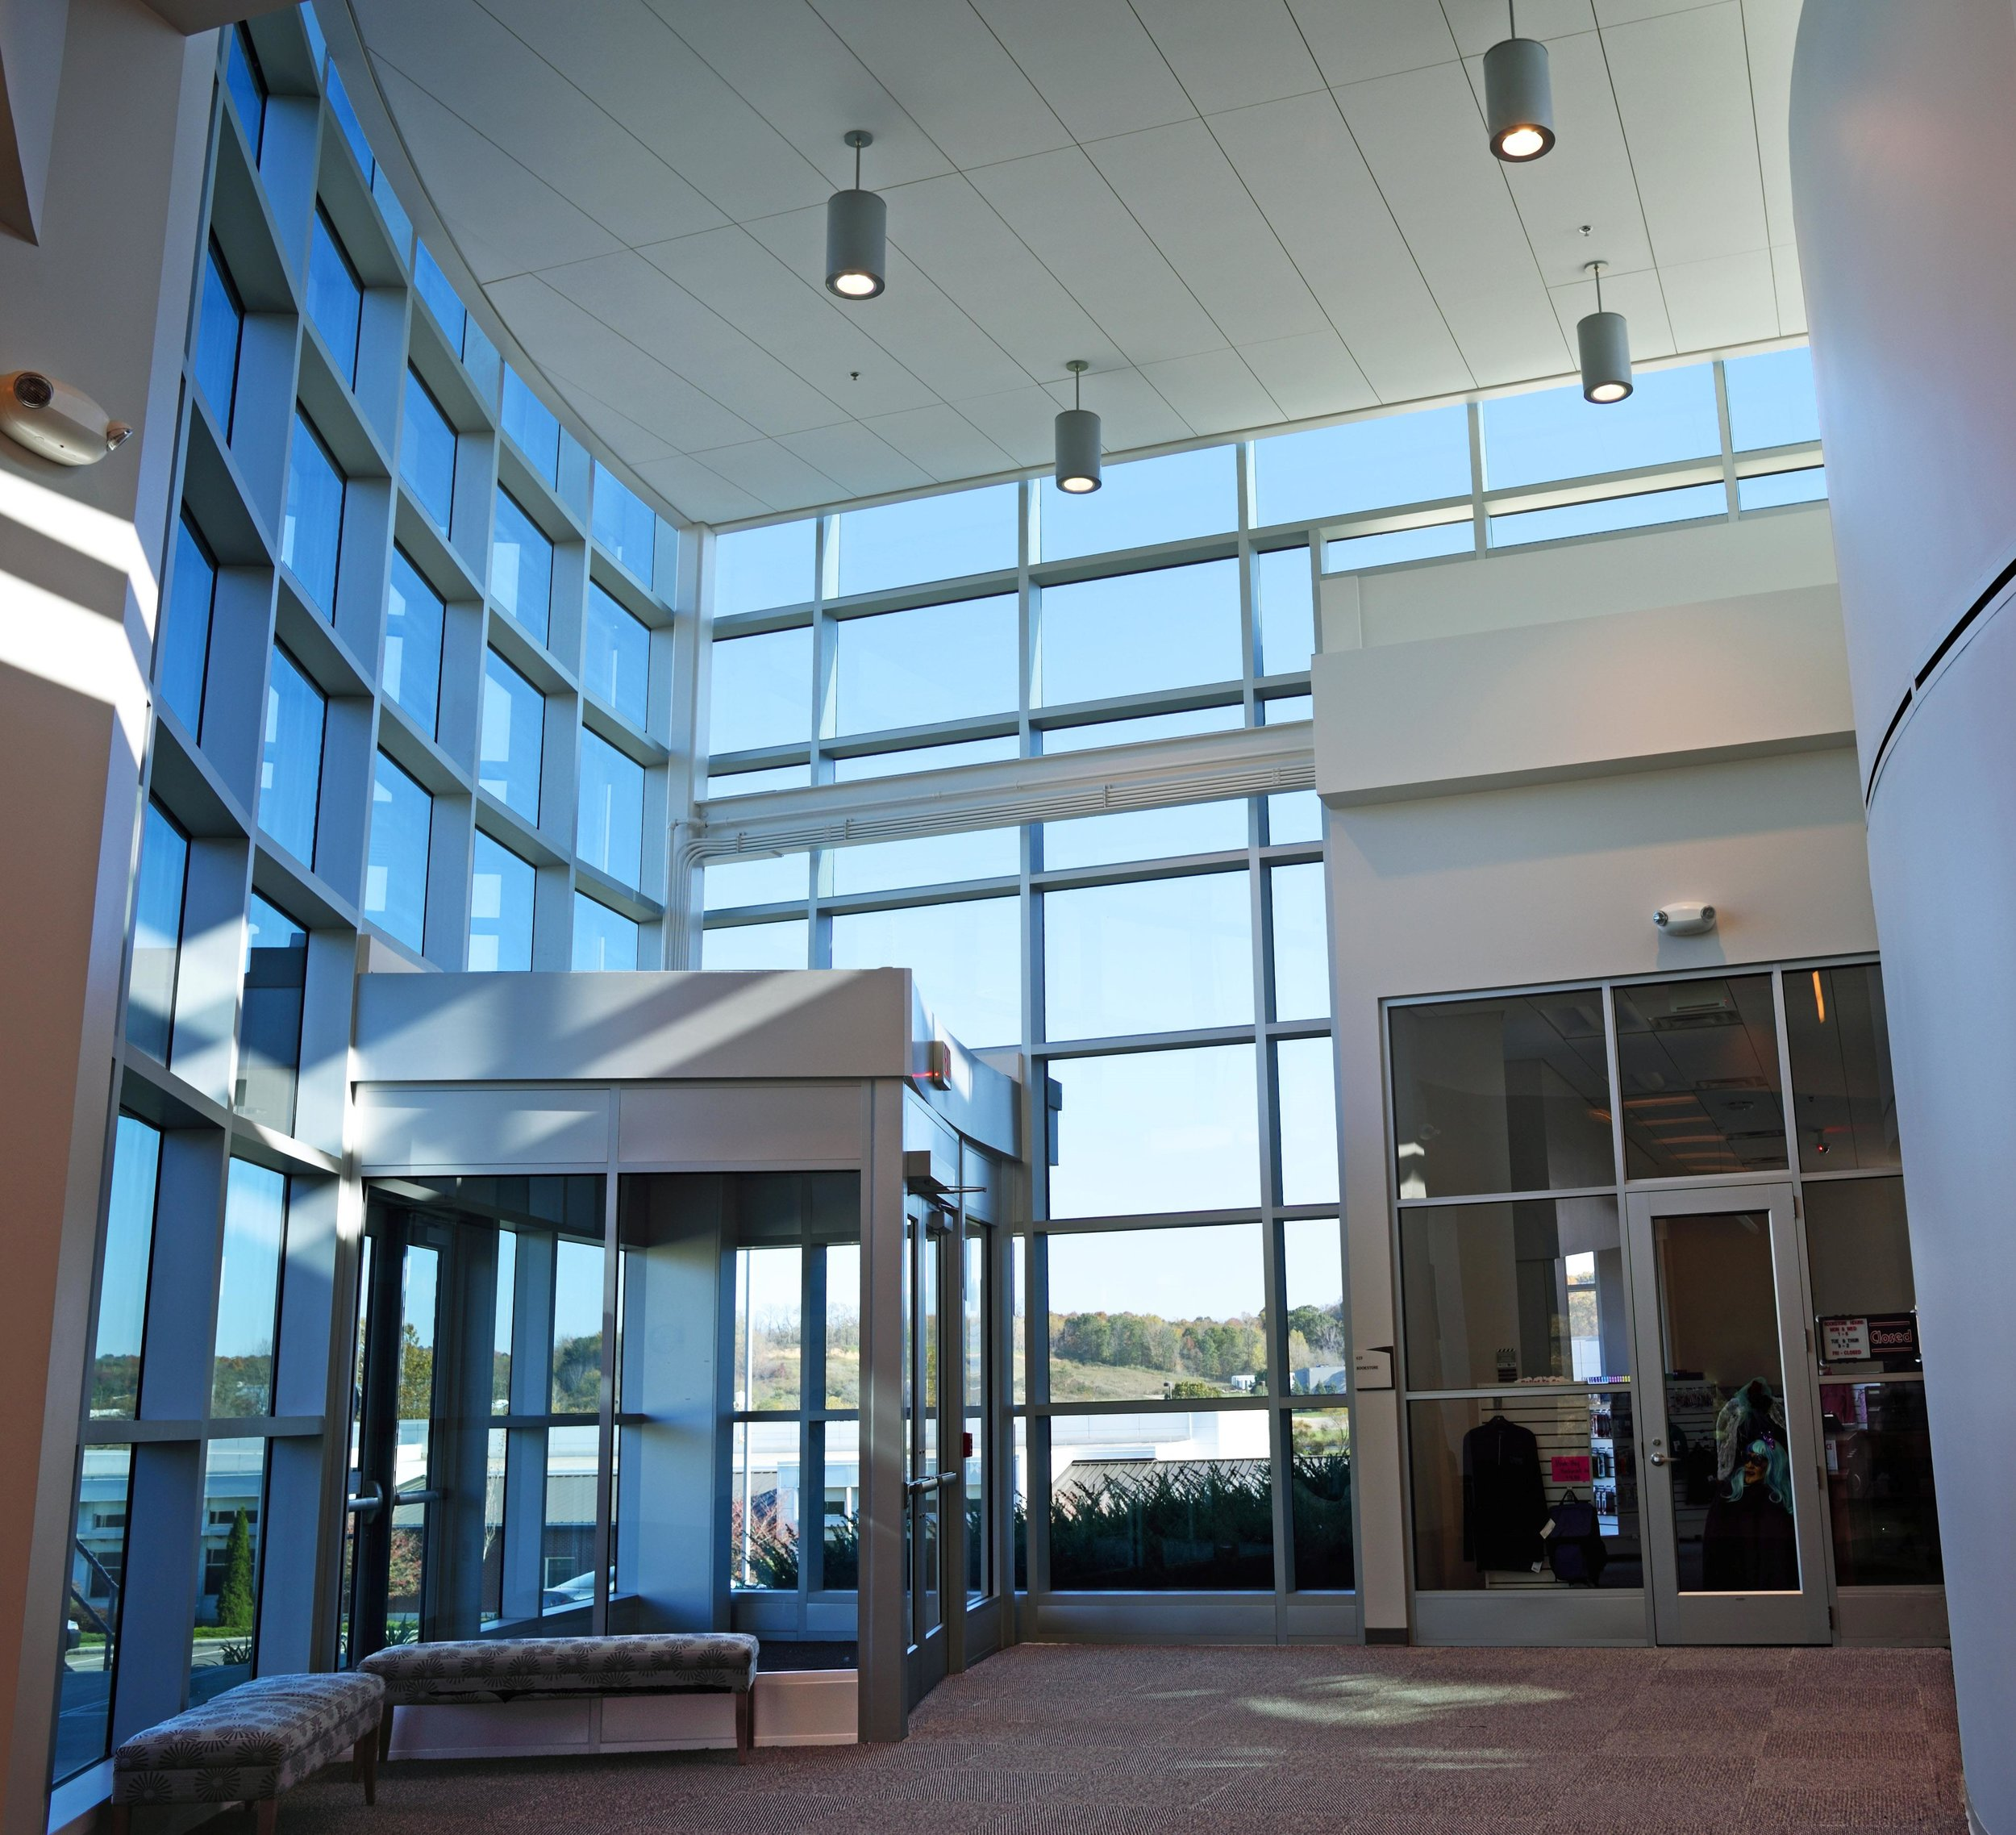 EPIC Center